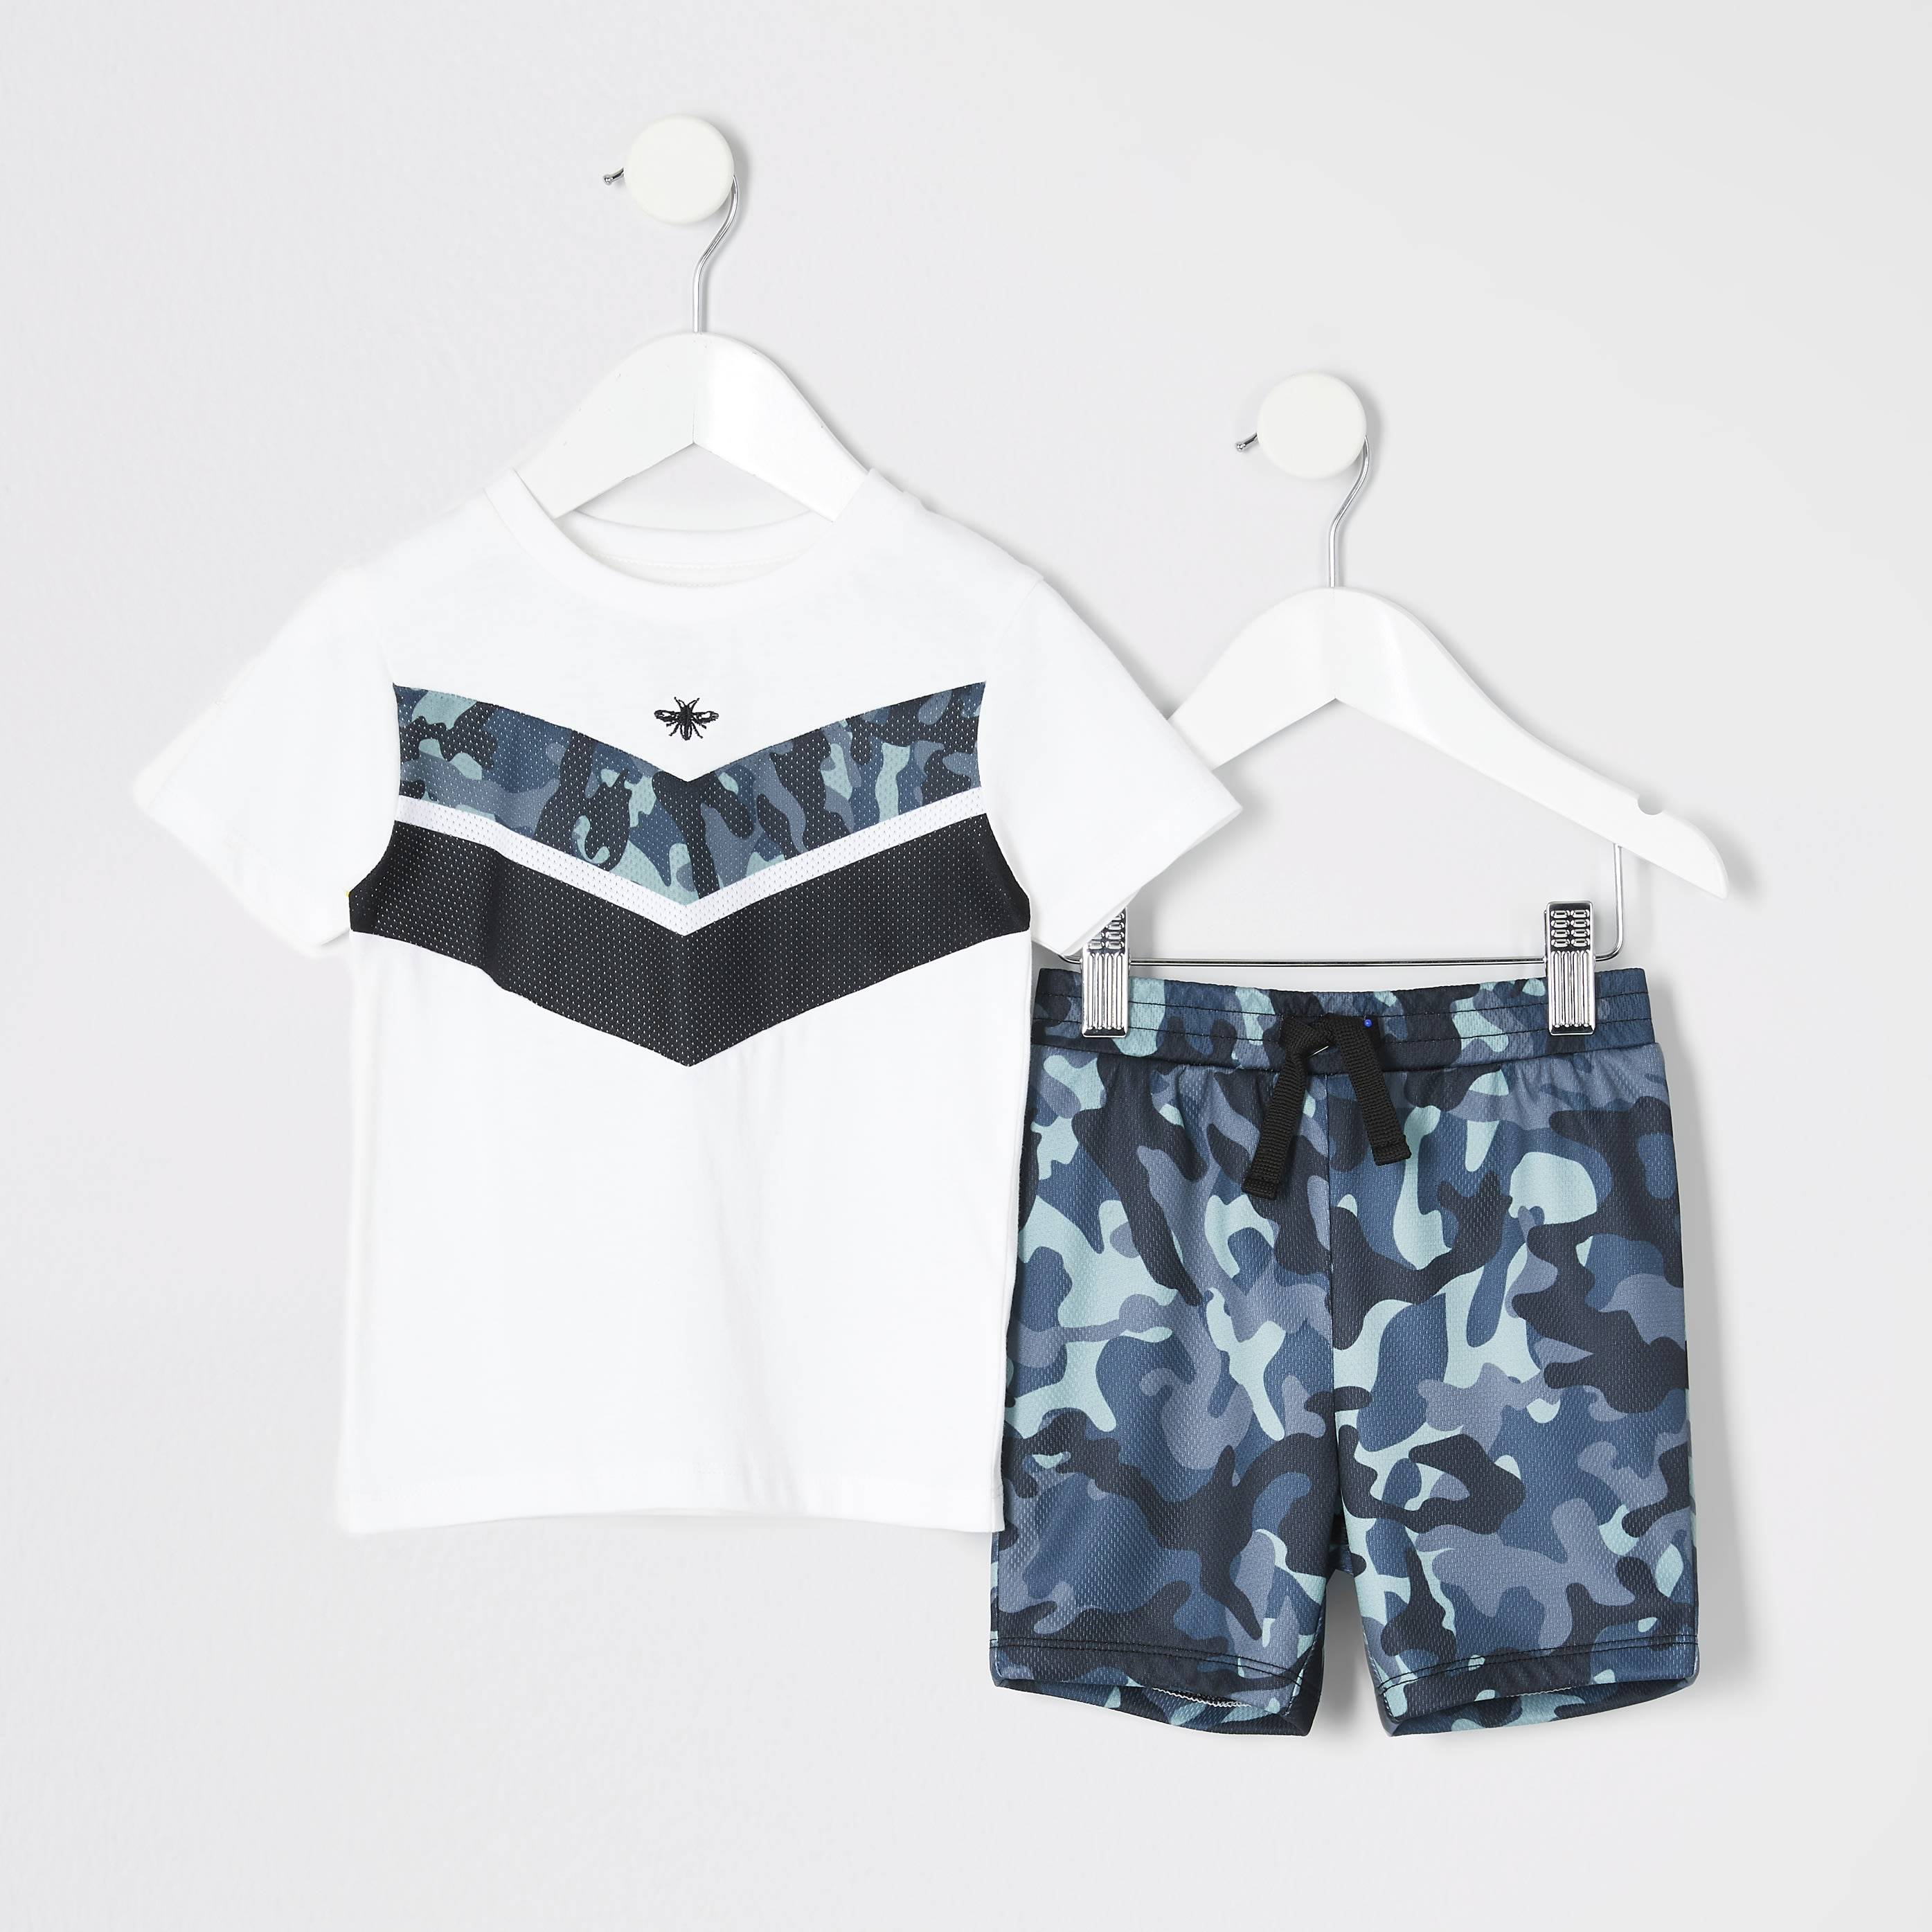 River Island Baby Boys White chevron T-shirt outfit (0-3 Mths)